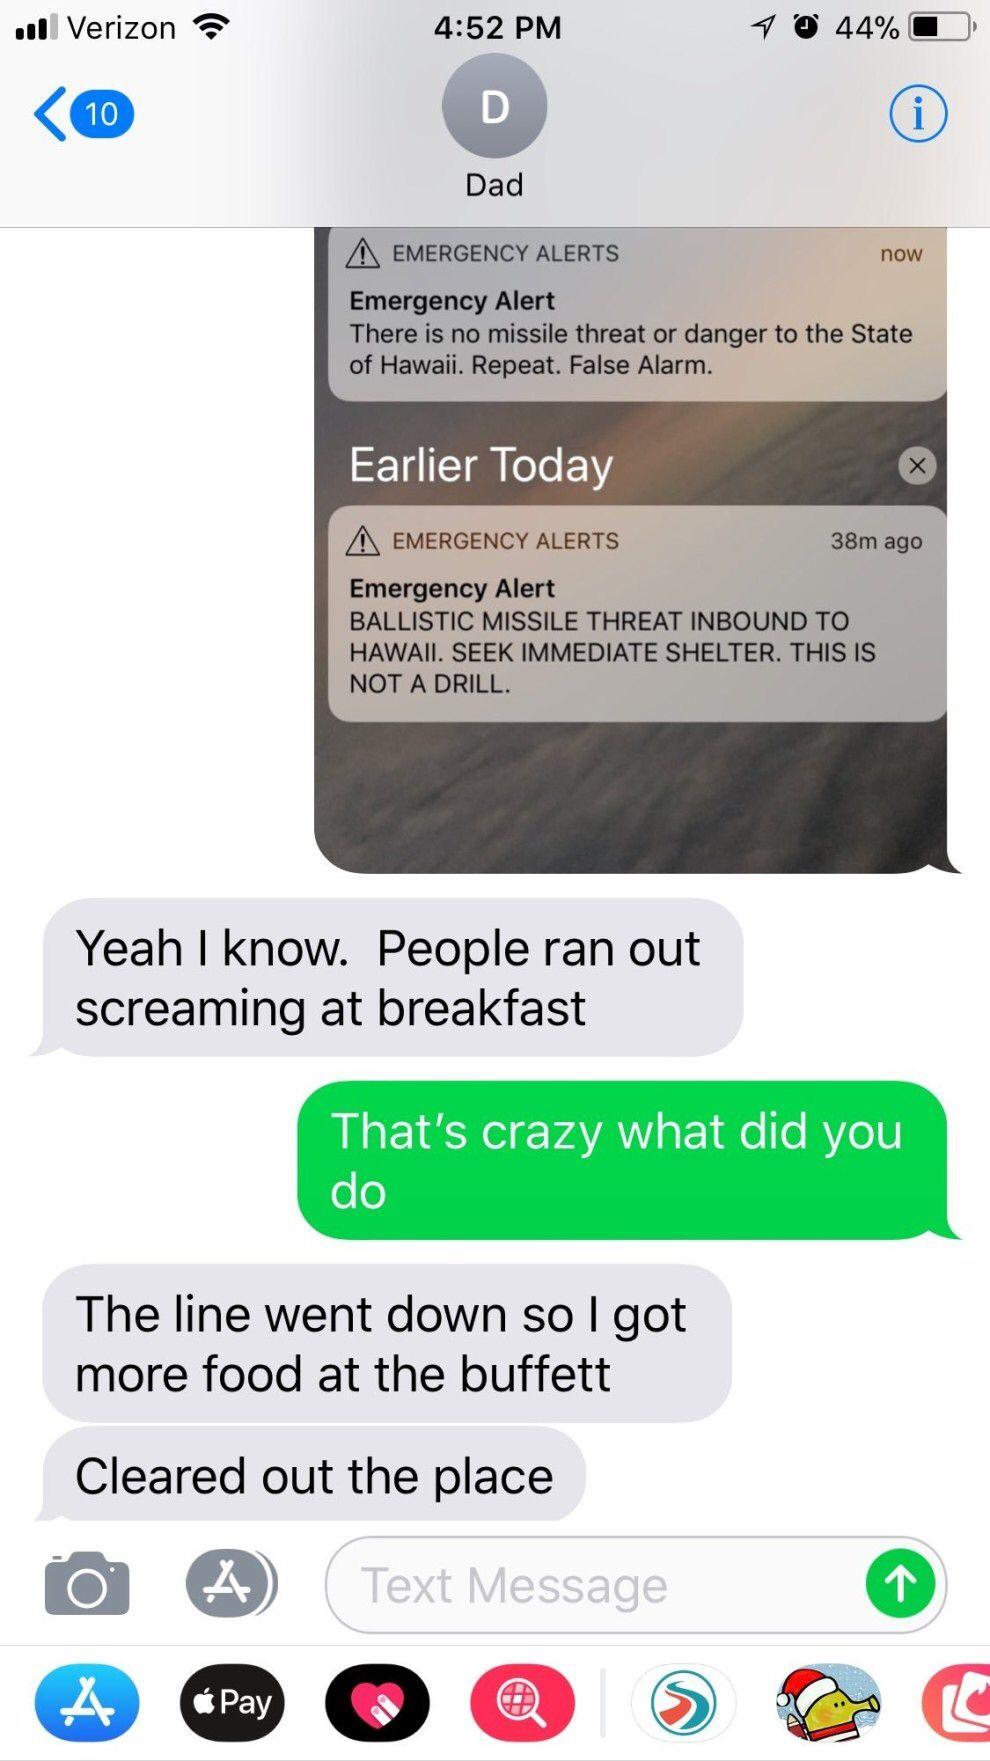 This dad taking advantage of a false alarm: